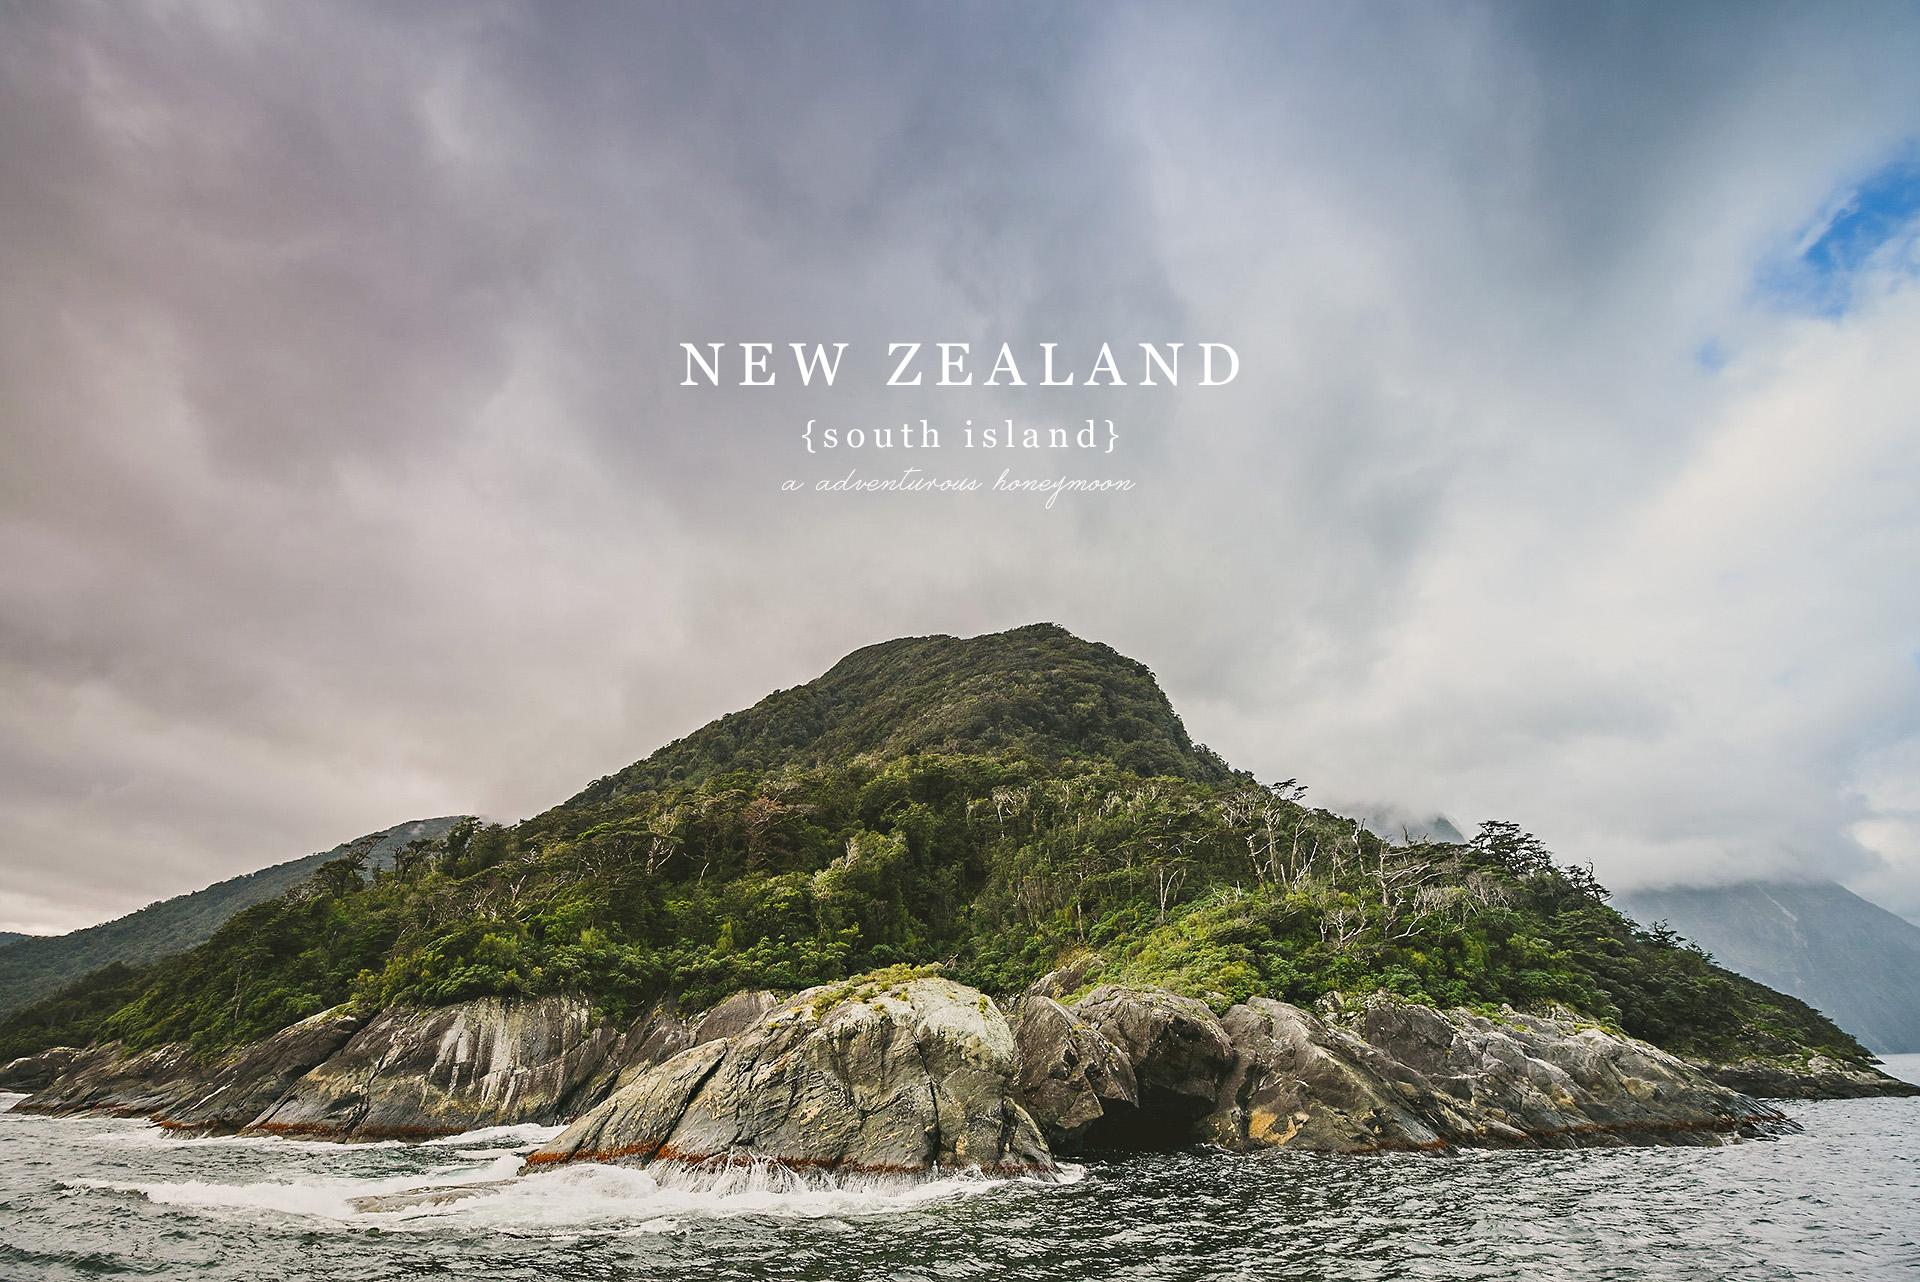 53-island-by-milford-sound copy